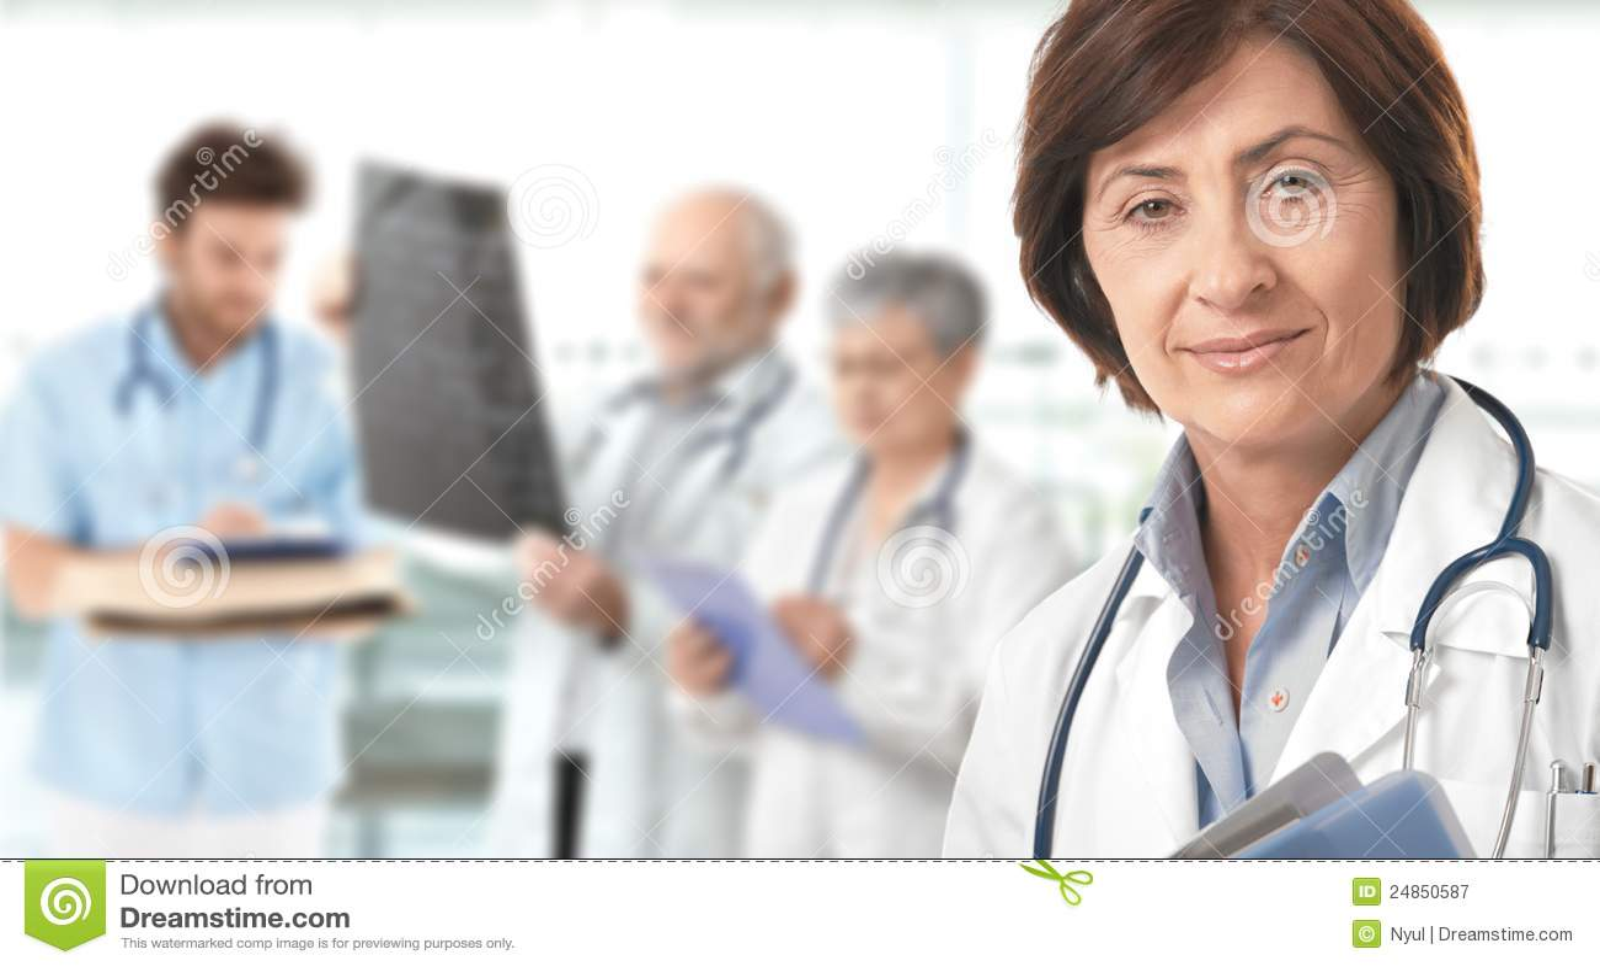 Background doctor female medical senior team